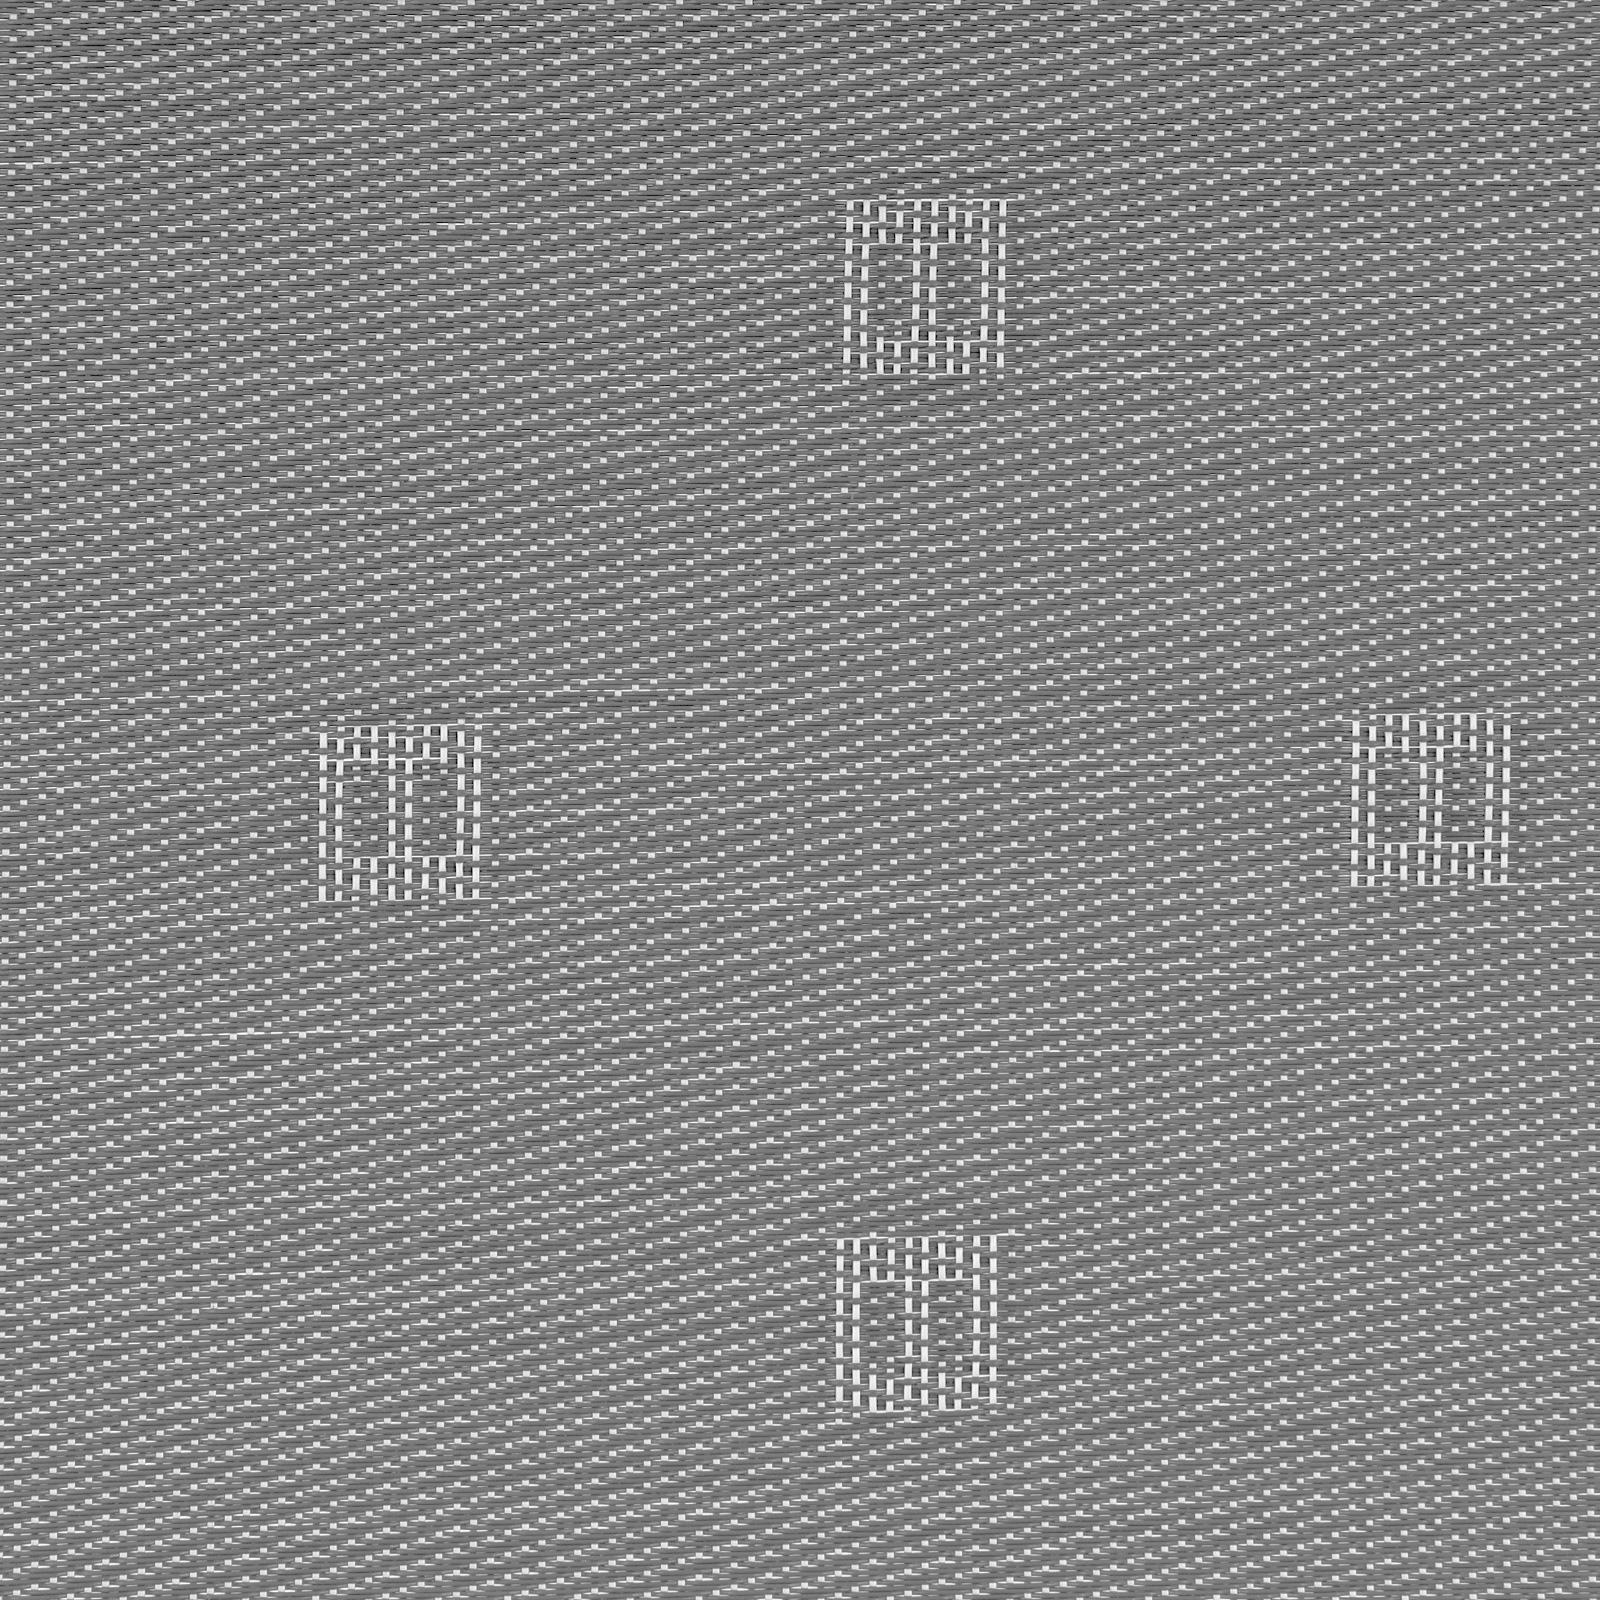 Via-Mondo-Campingstuhl-Klappstuhl-Galet-L-T-H-68x84x121cm Indexbild 7